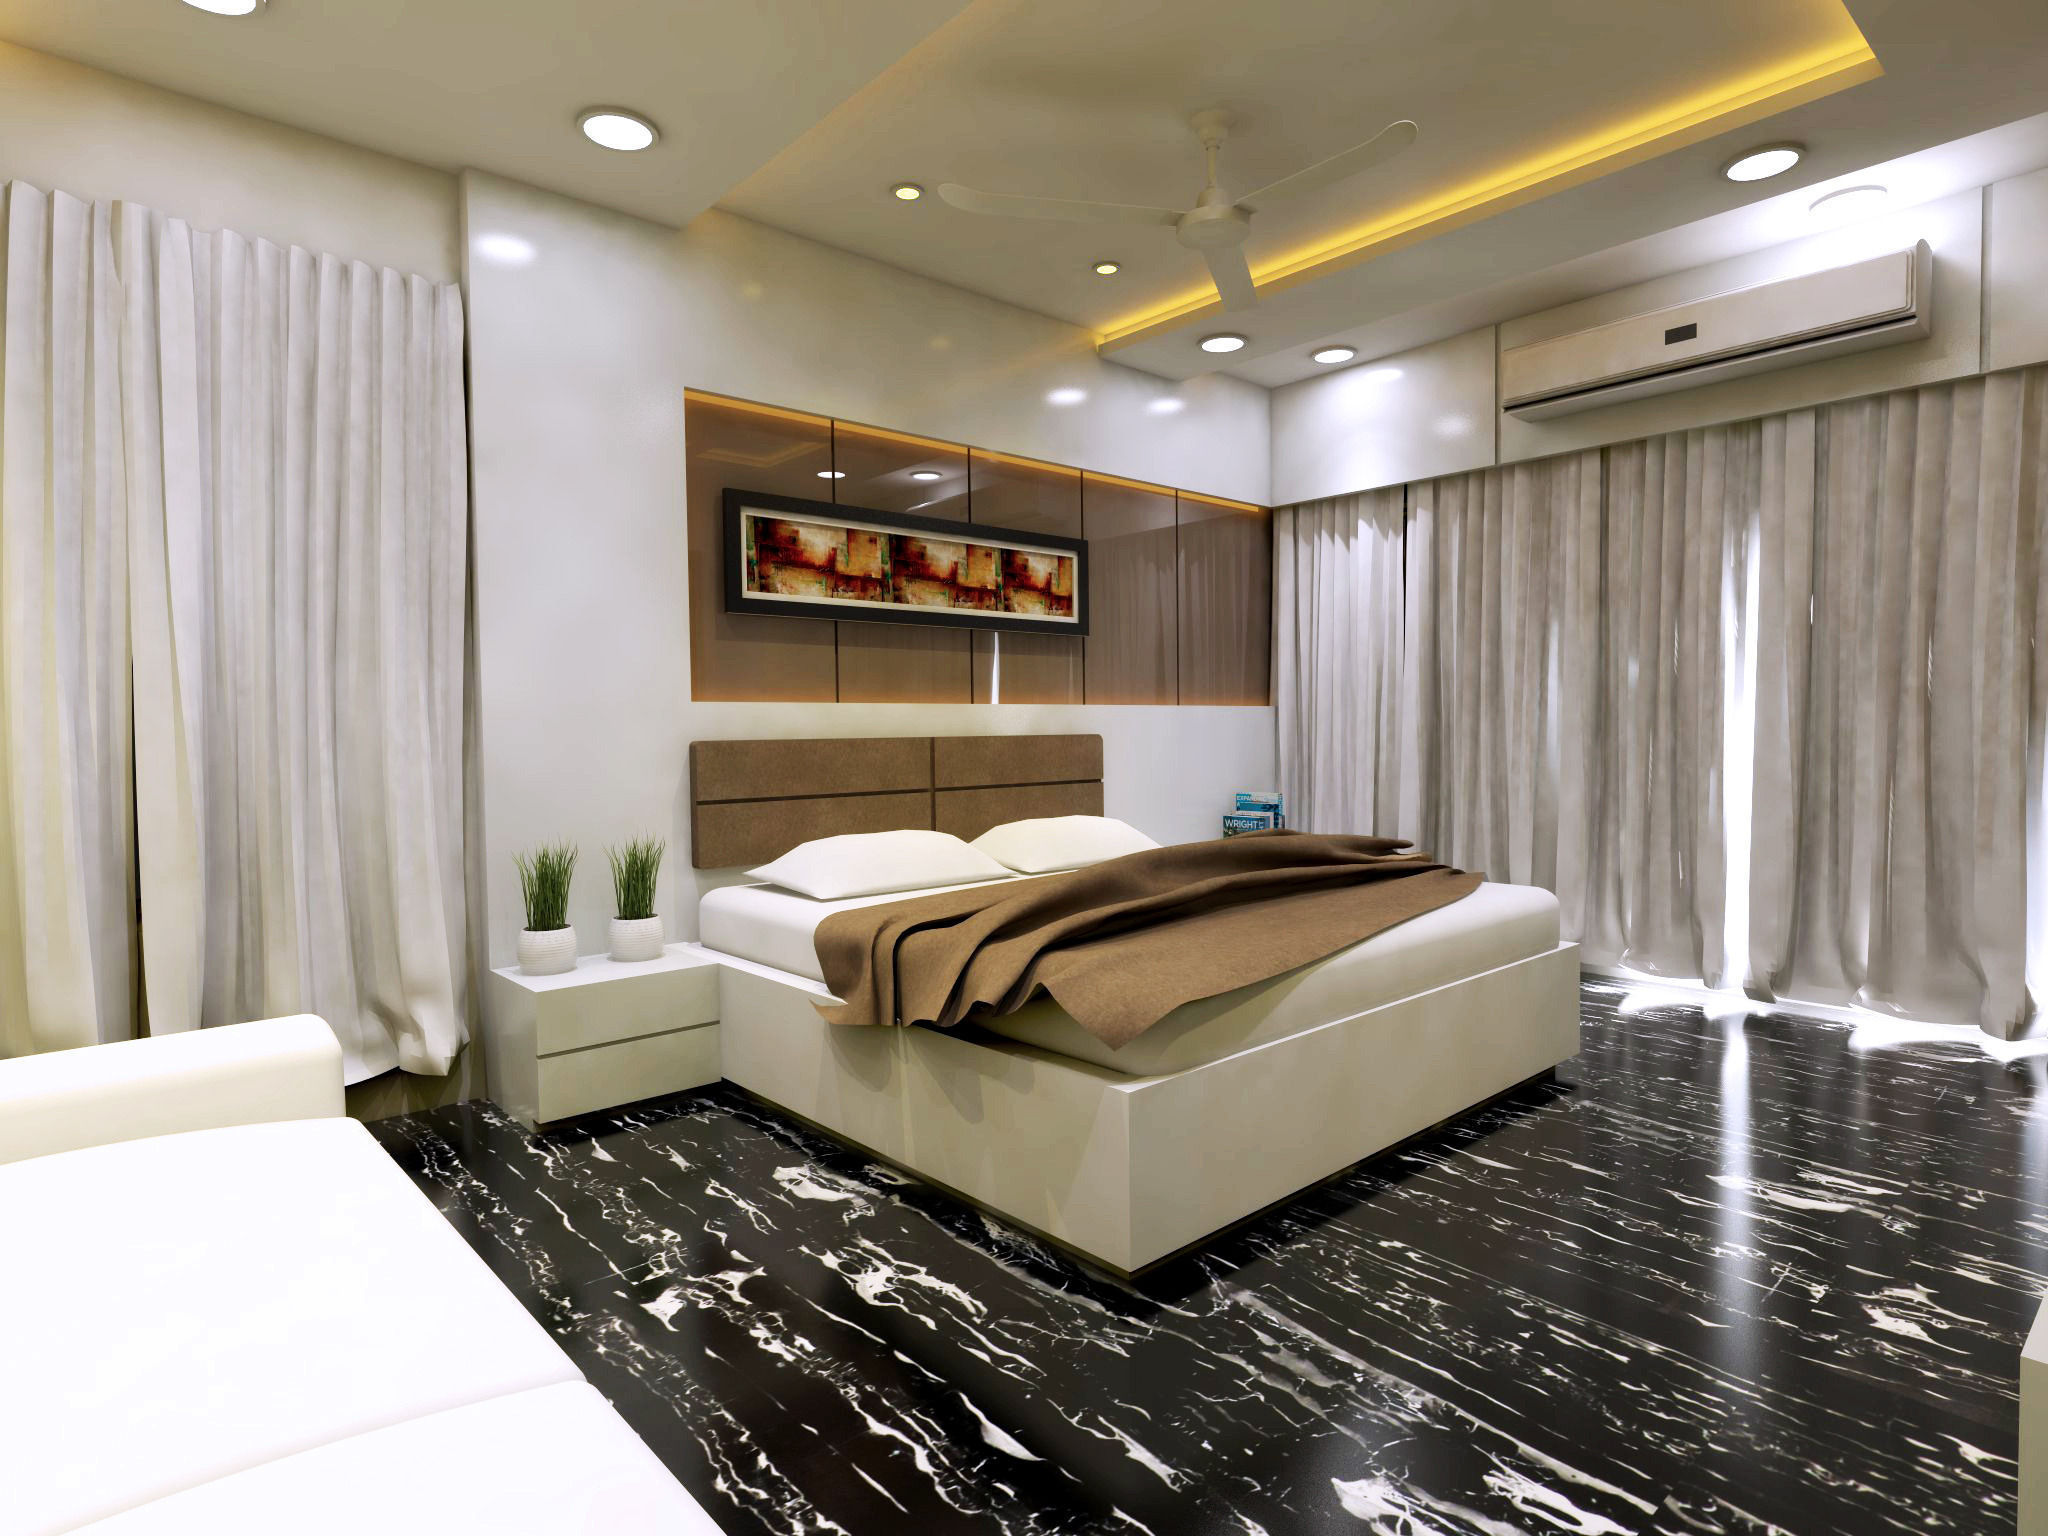 Modern bedroom interior vray rendered 3d model skp for Vray interior